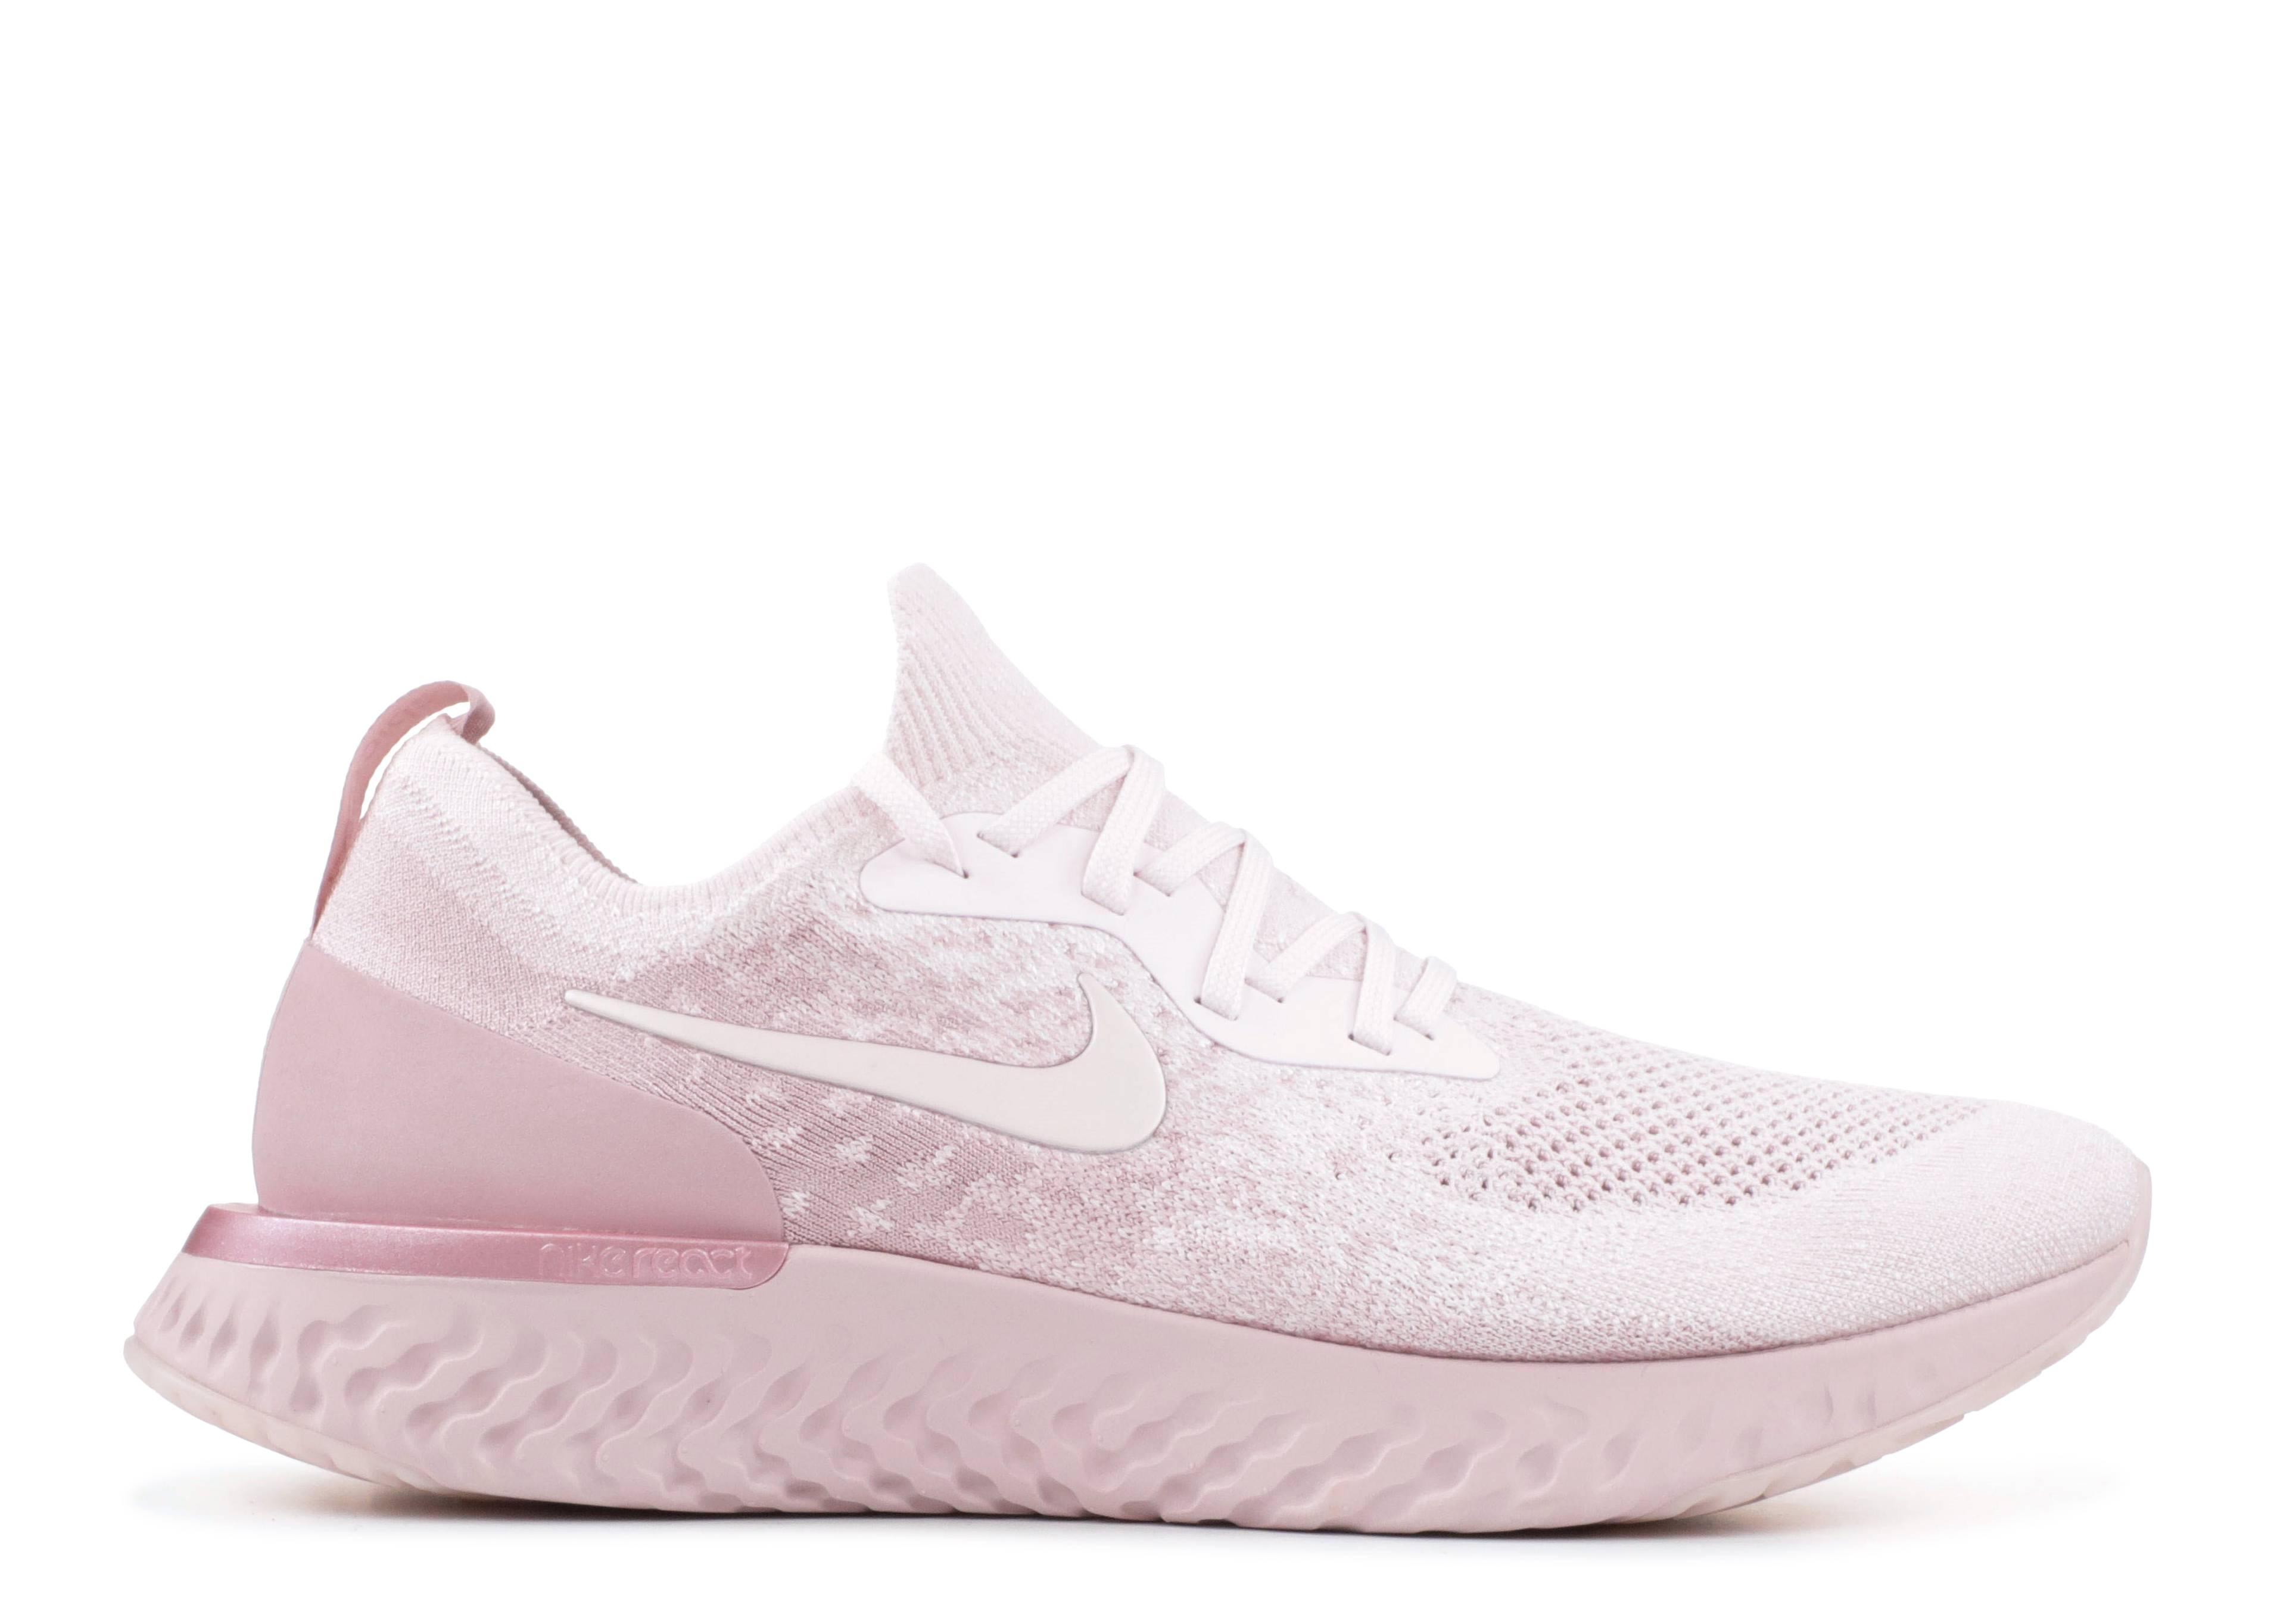 8d0fc0f6452 Nike Epic React Flyknit - Nike - aq0067 600 - pearl pink